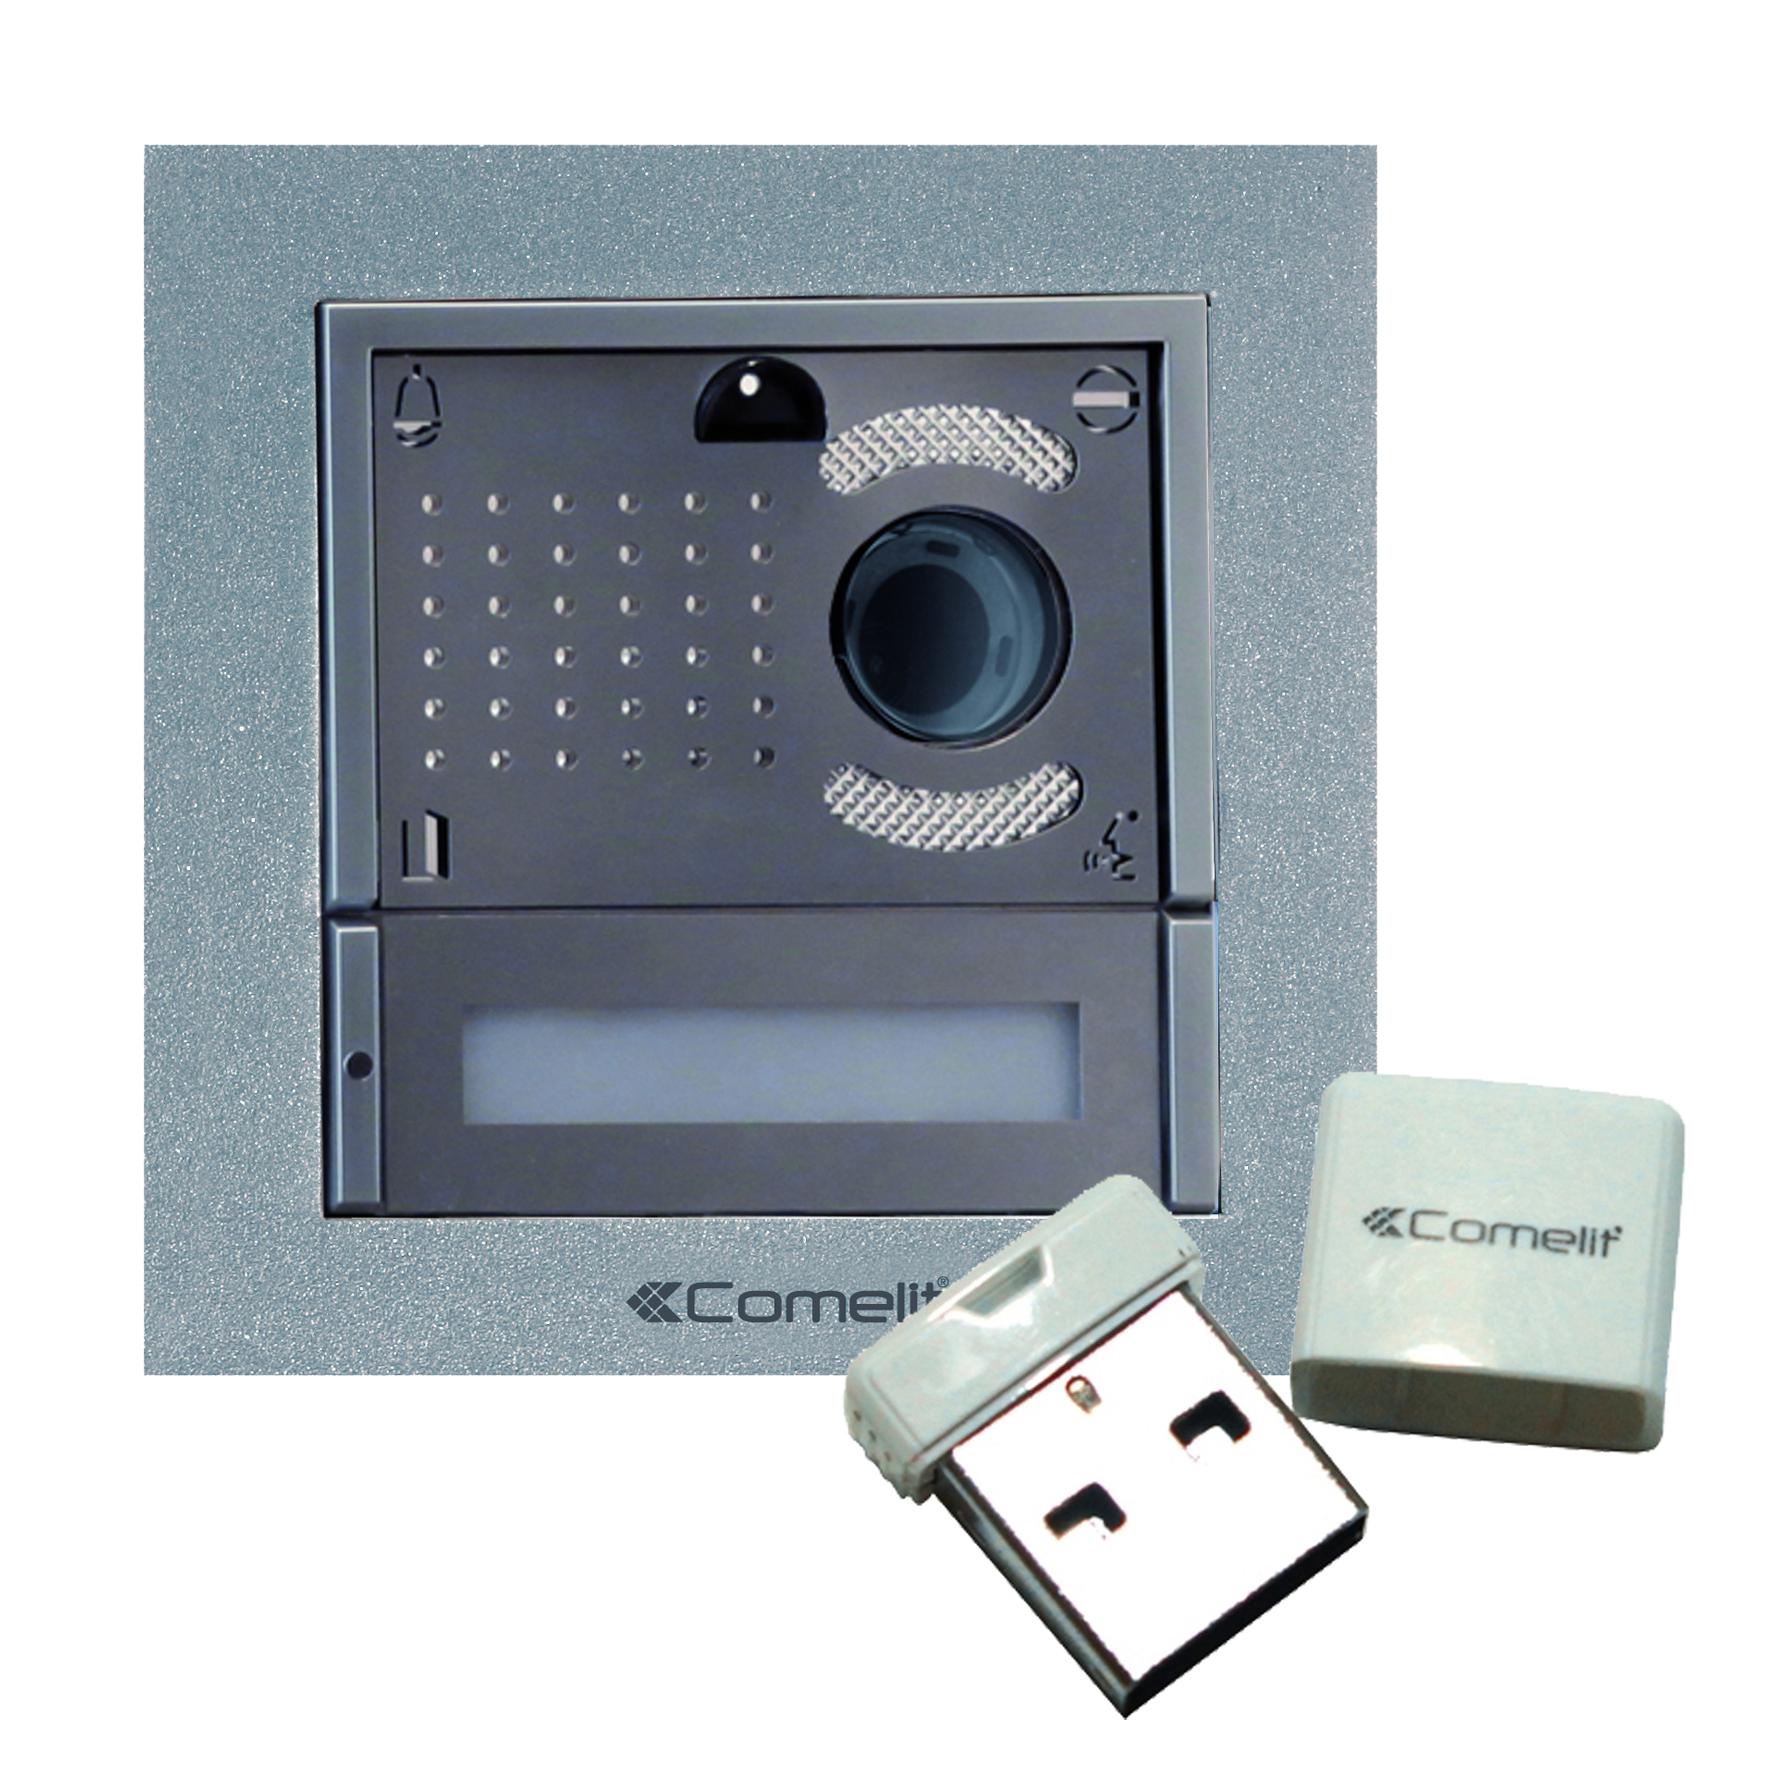 1 Stk Videokit IKALL METAL mit einem PC Dongle für VIP SP8501HIM-